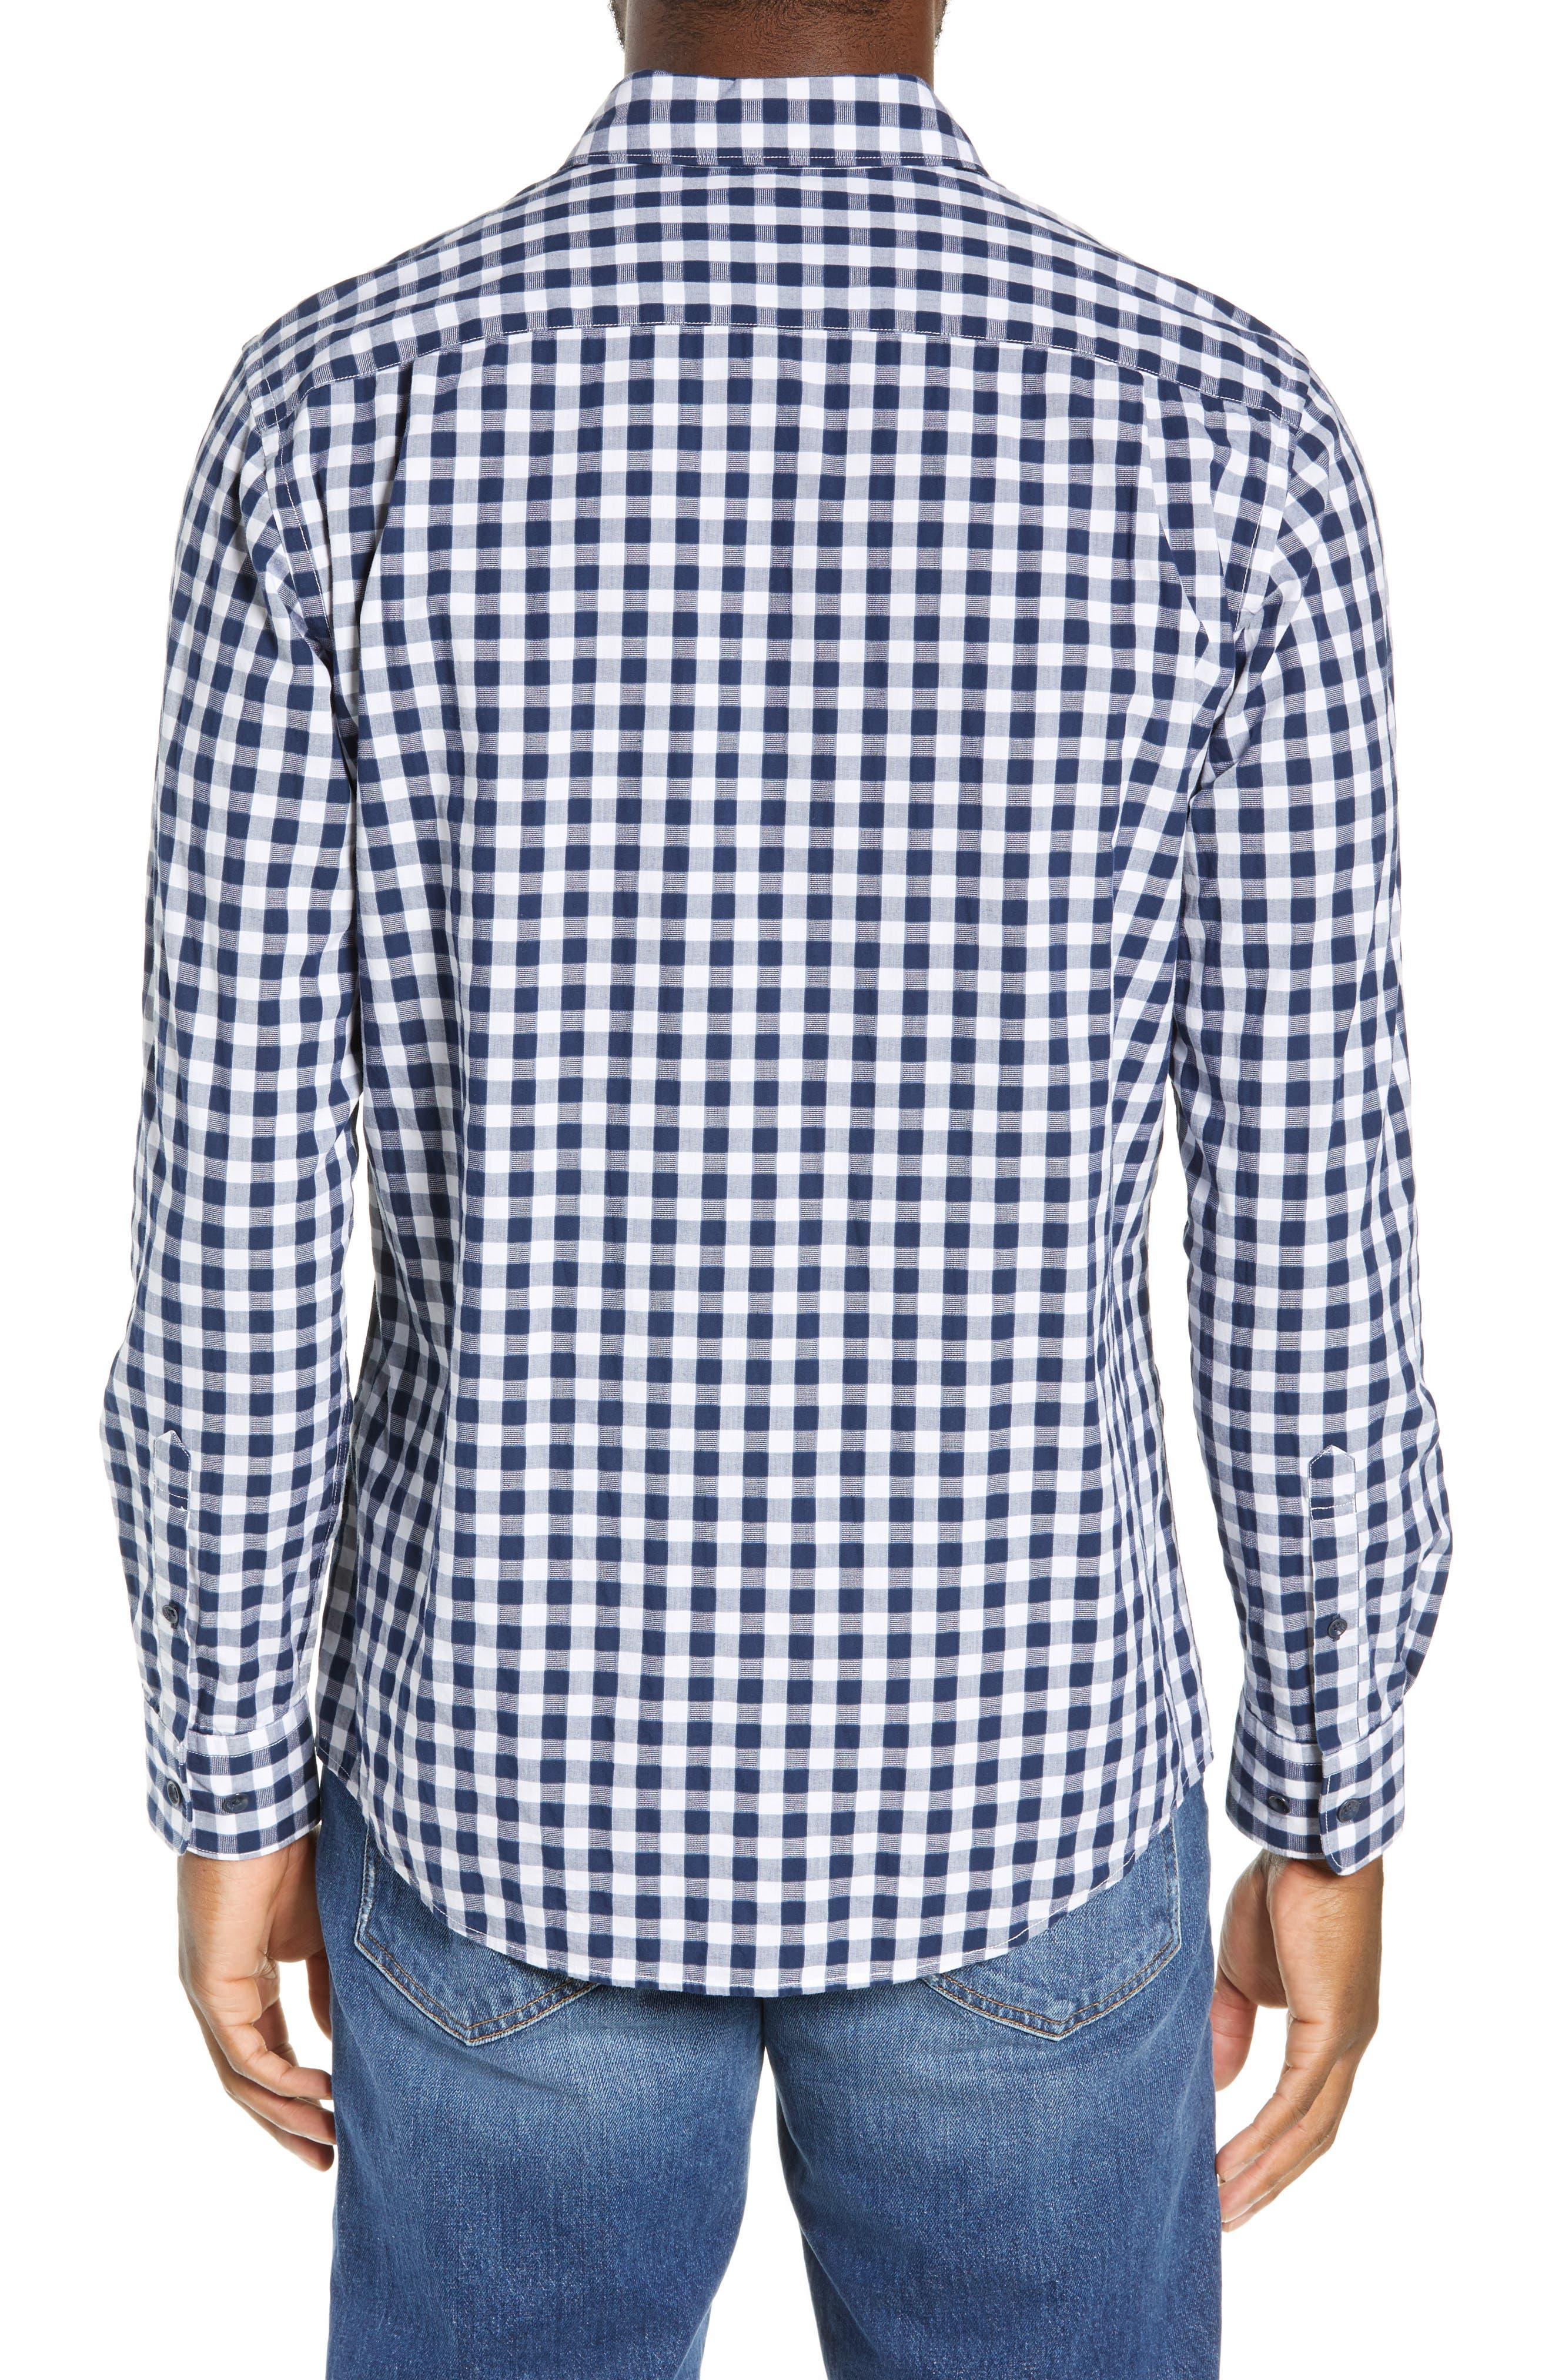 RODD & GUNN, Dixon Check Sport Shirt, Alternate thumbnail 3, color, NAVY